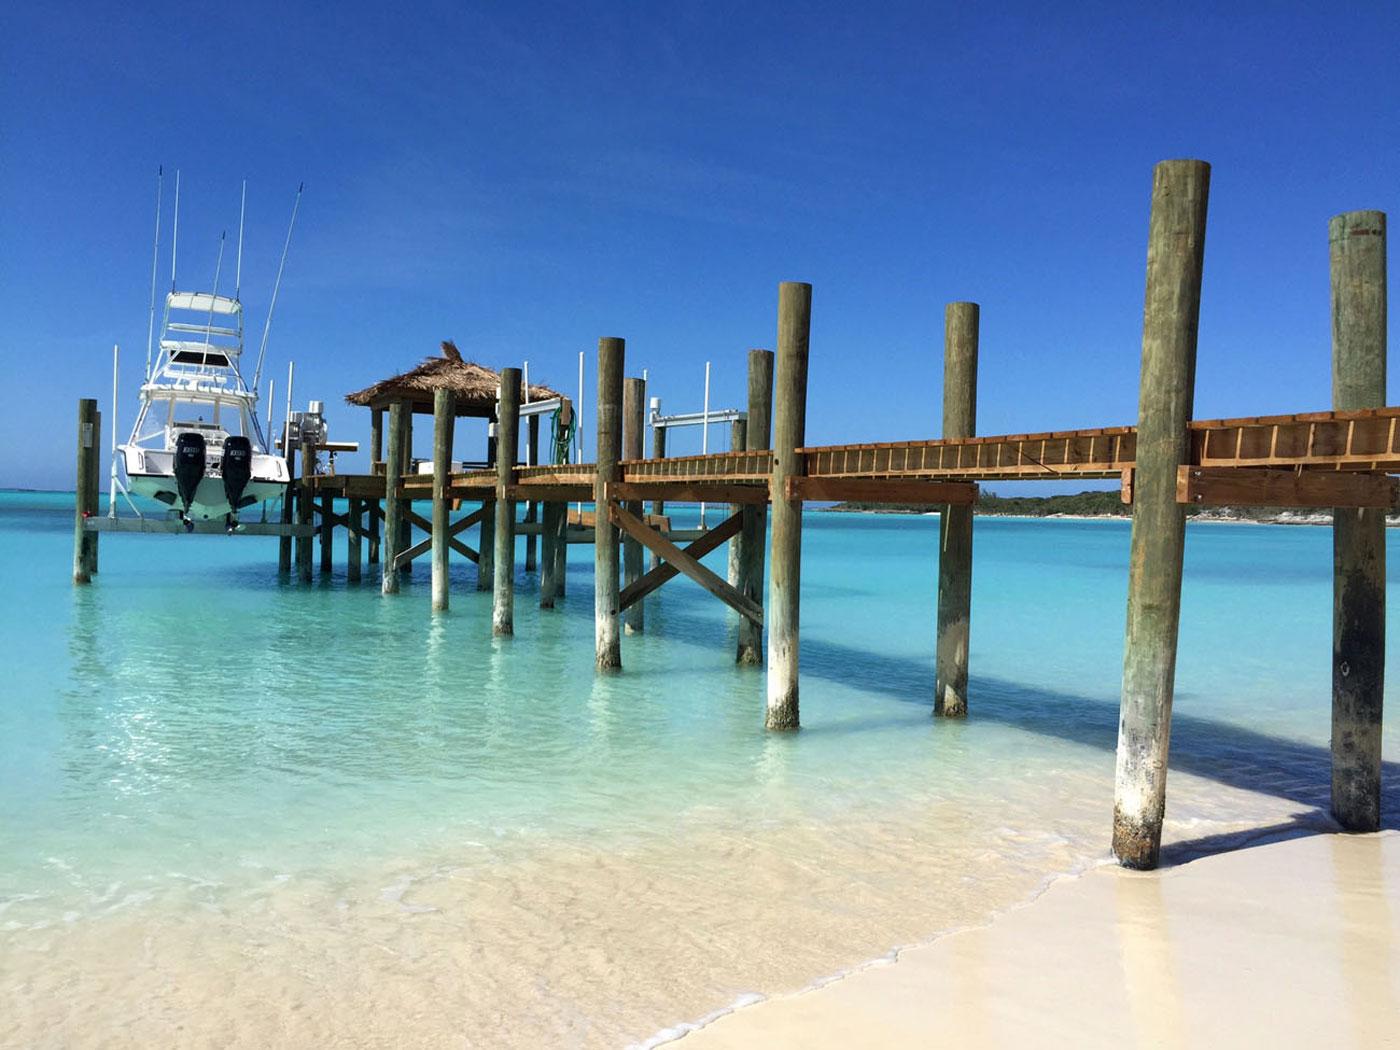 dock on turtles beach in exuma